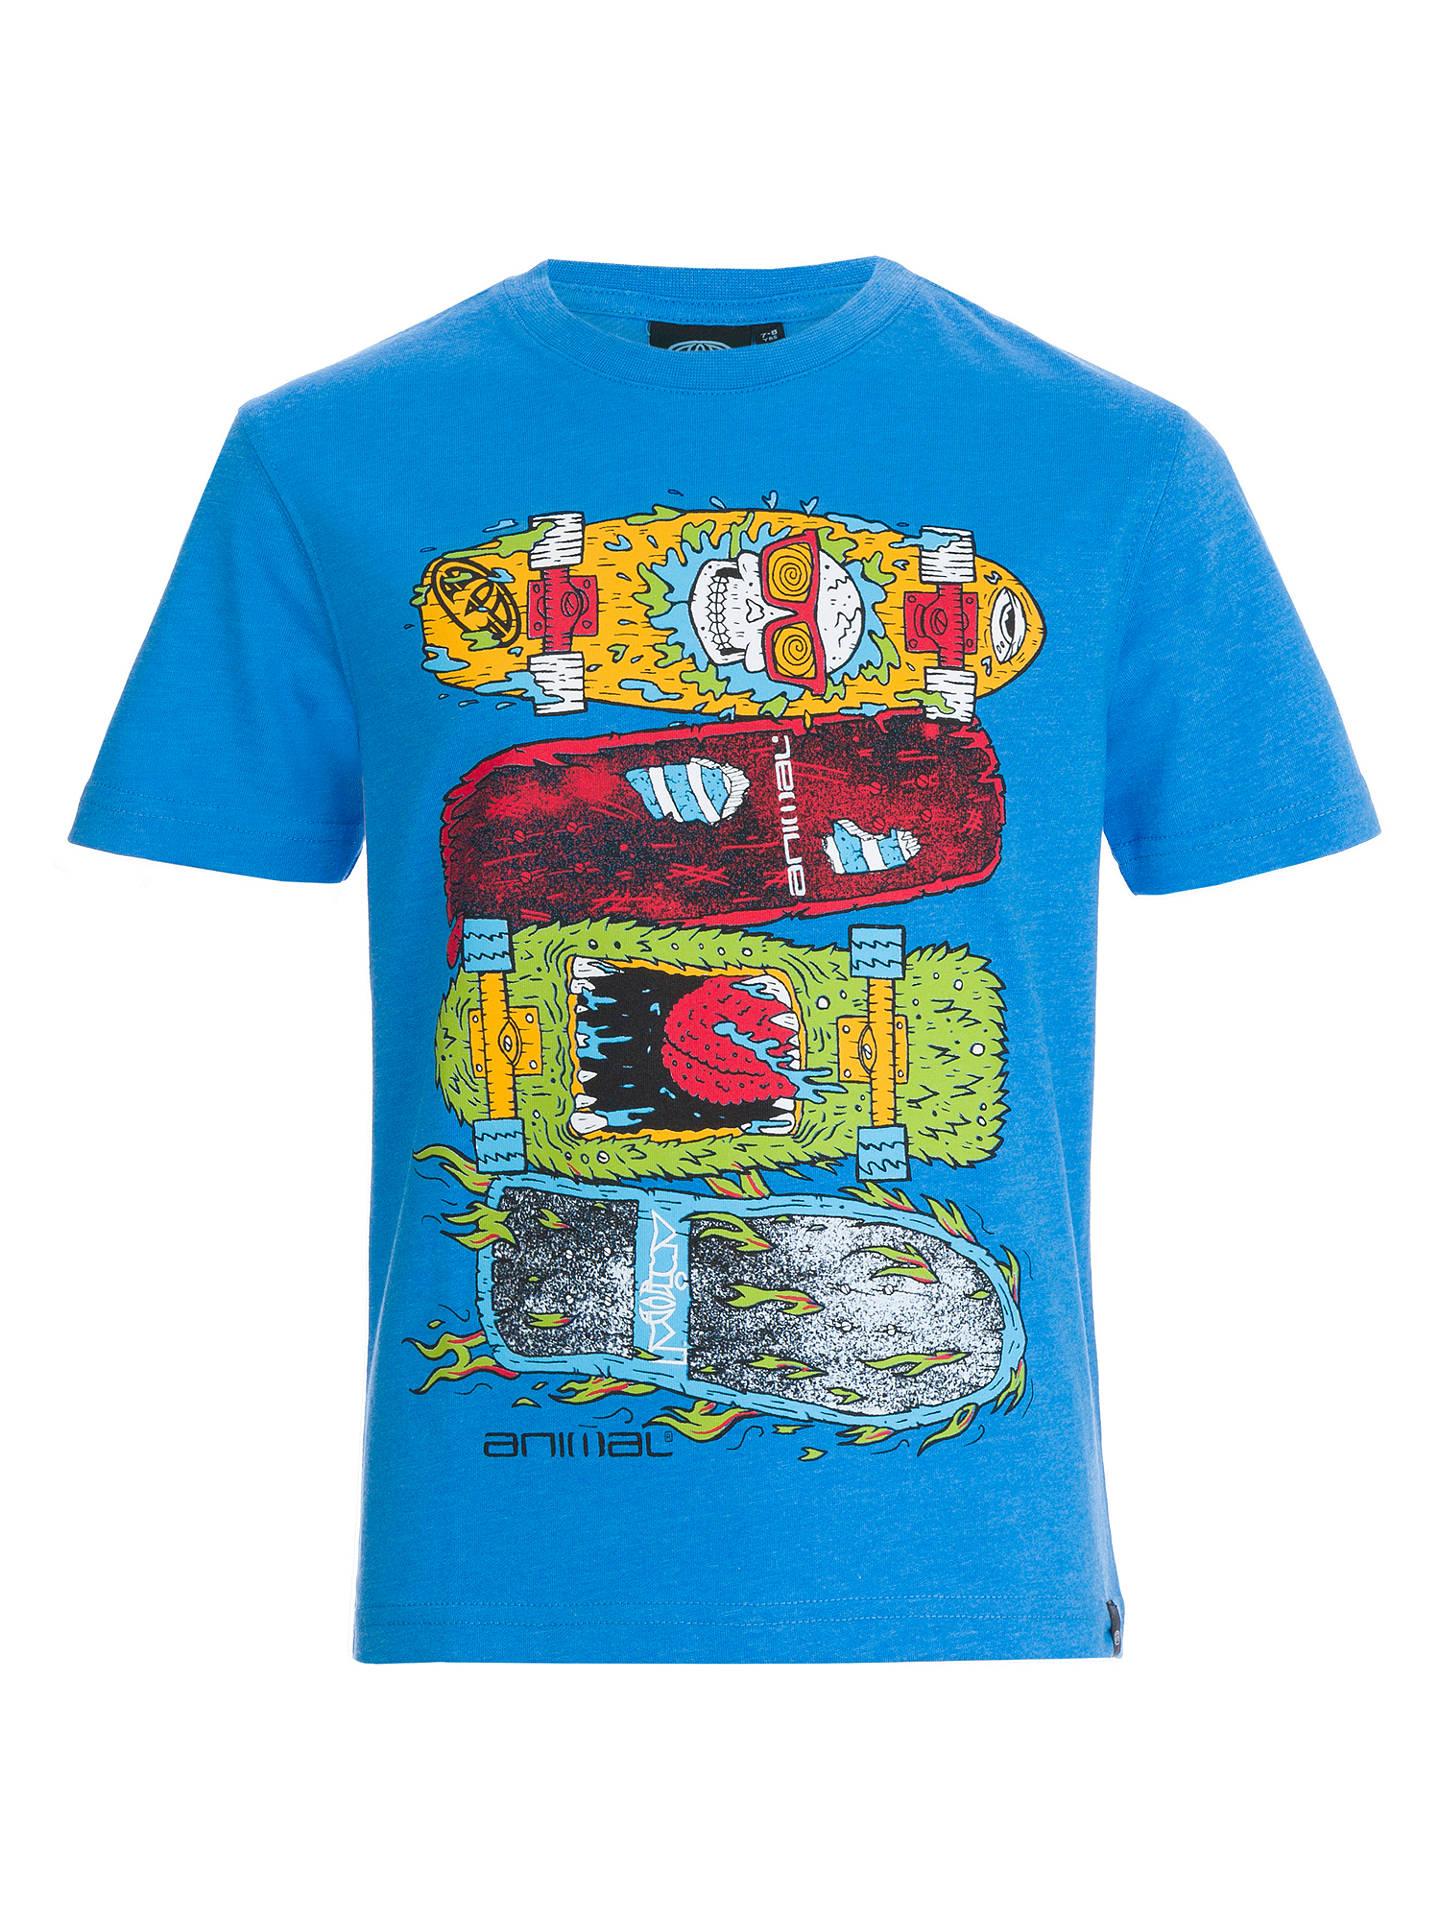 e1ec3ee2d7 Animal Boys' Skateboard Graphic T-Shirt, Blue at John Lewis & Partners